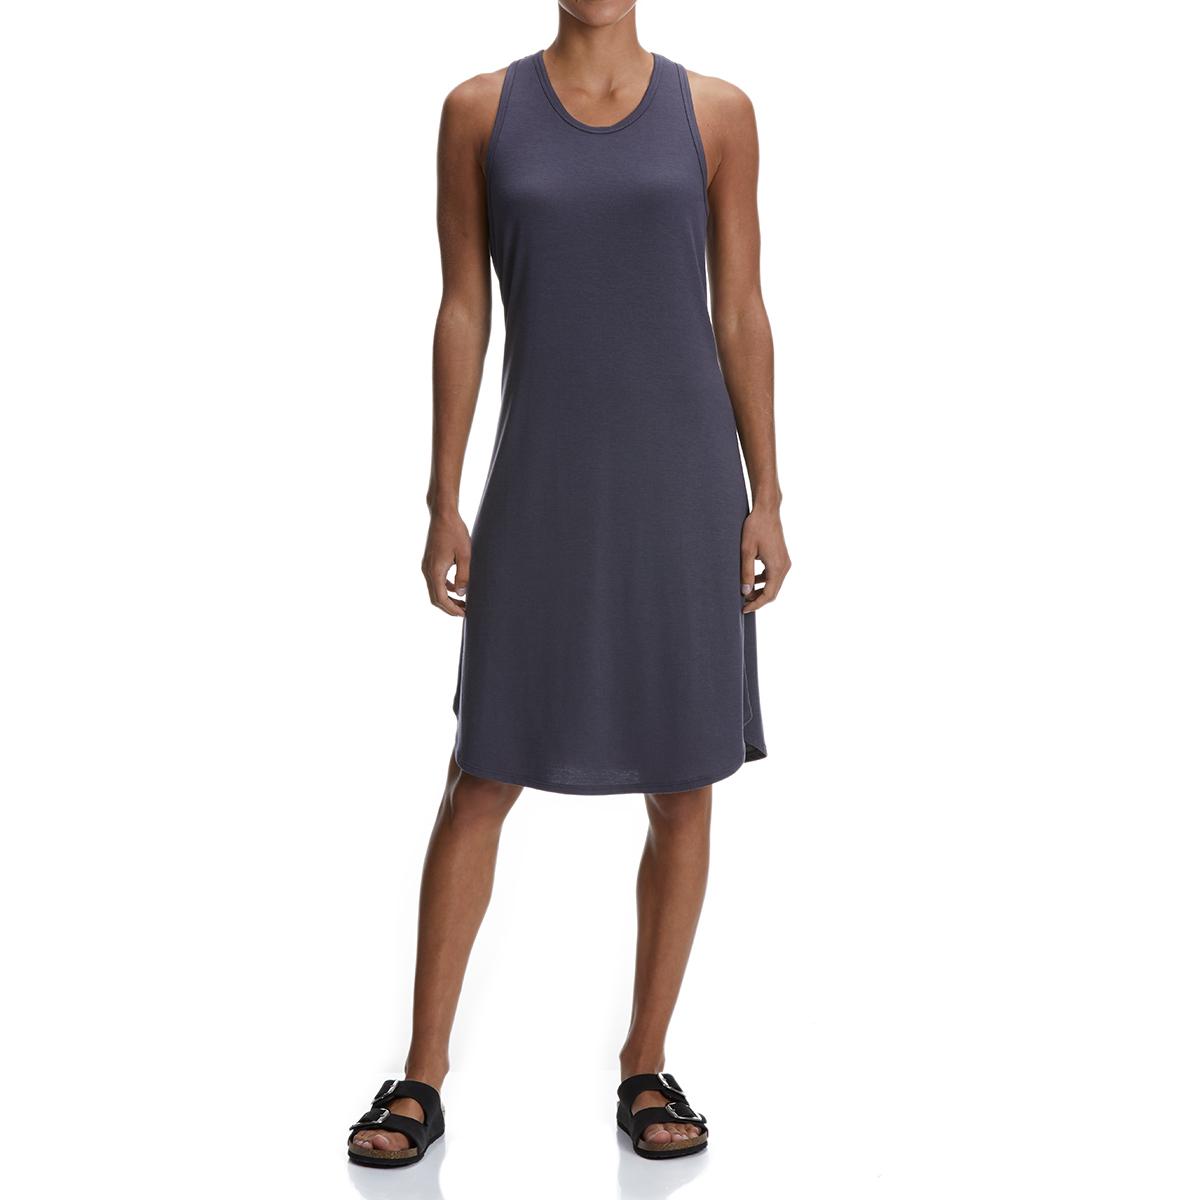 Ems Women's Highland Twist Back Dress - Black, L